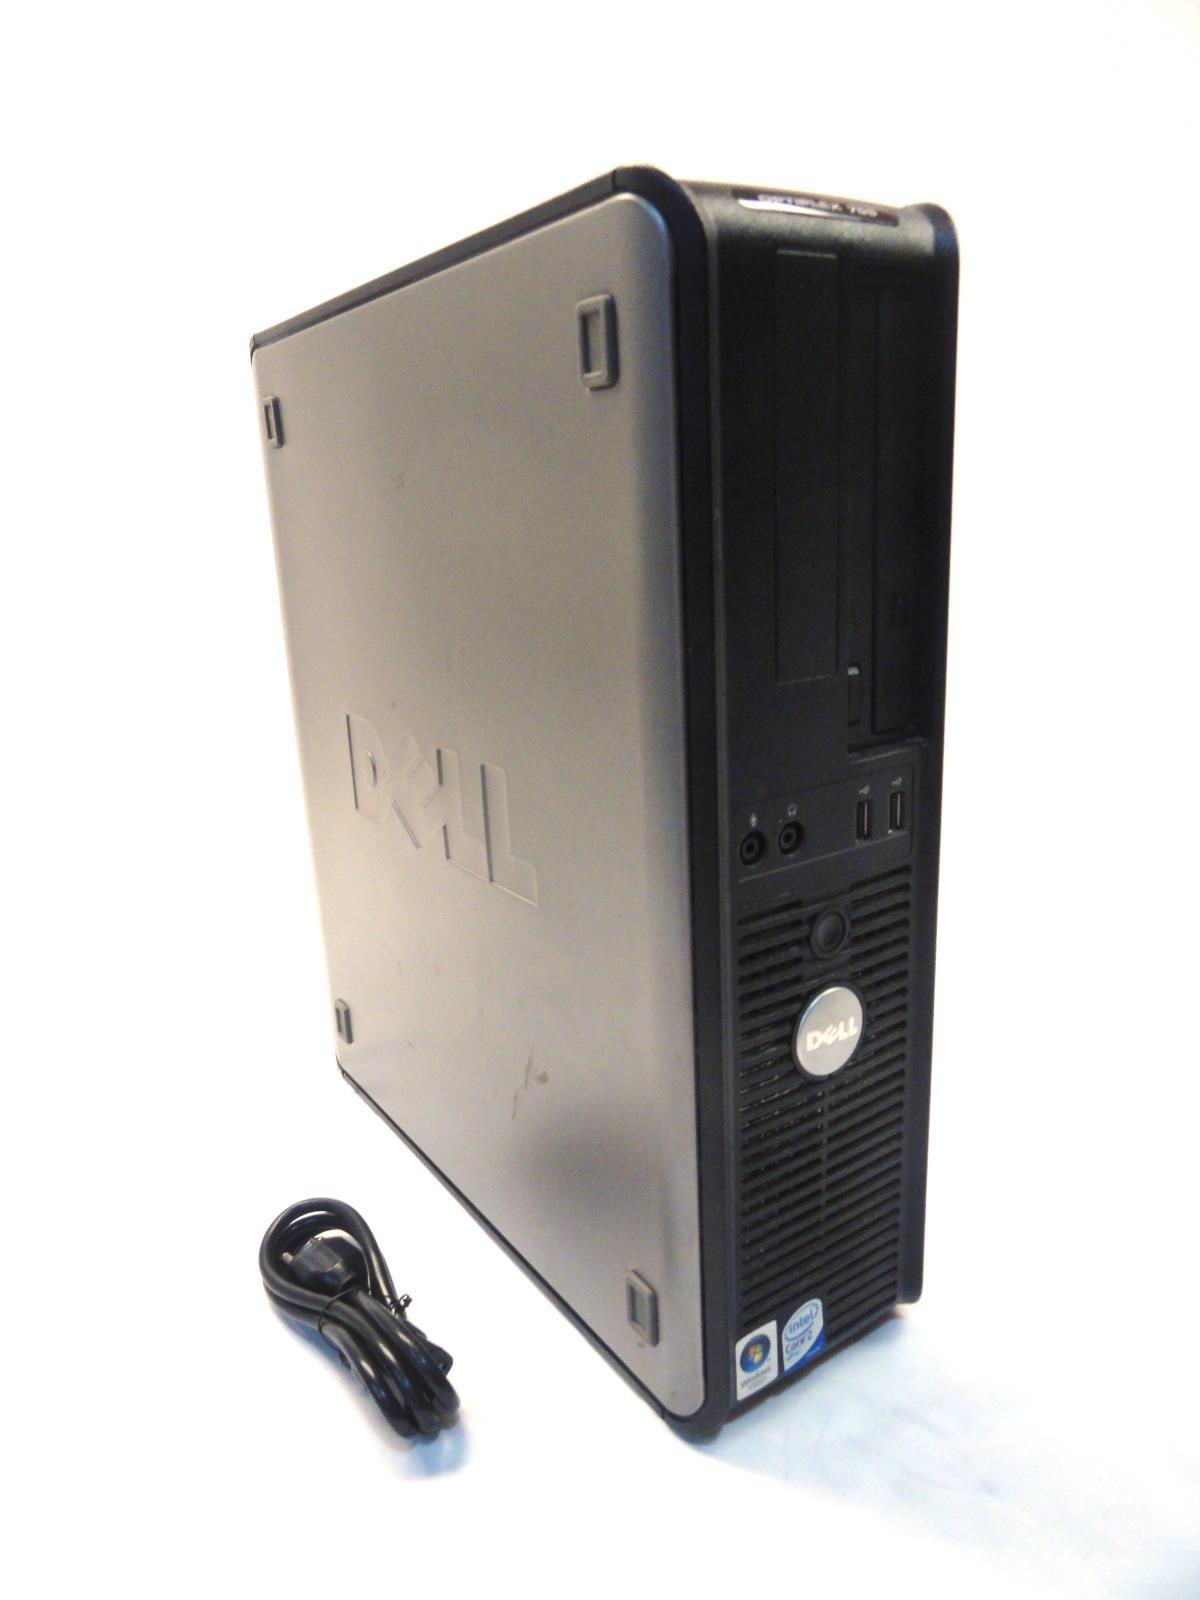 Details about Dell Optiplex 755 Desktop   2 33GHz Core 2 Duo E6550   4gb  DDR2   250gb   DVD-RW